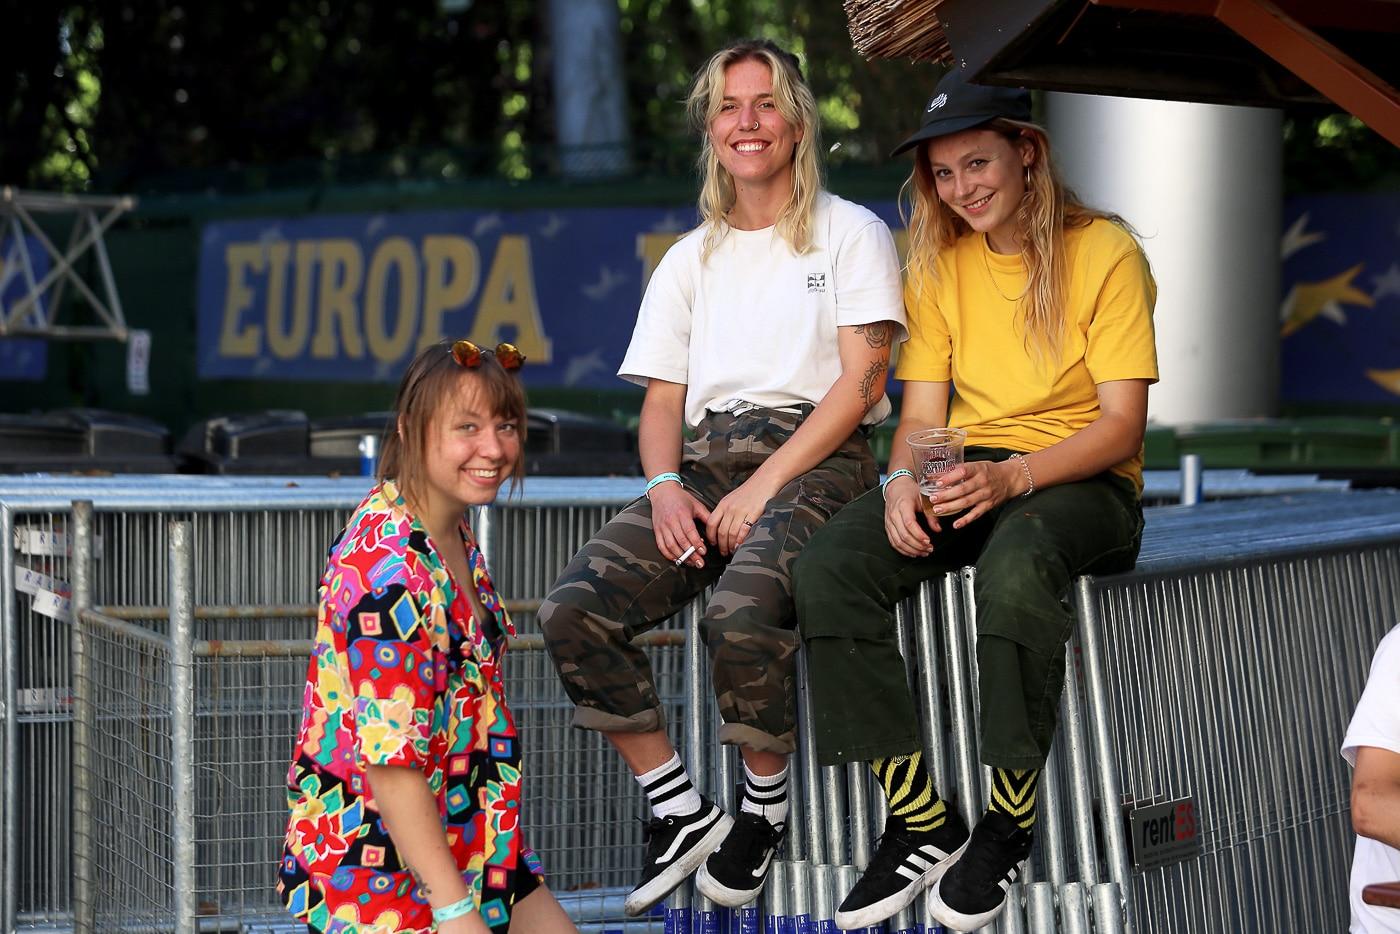 Club-of-skaters-cos-europapark-Thomas-Gentsch-photo-irregularskatemag-3